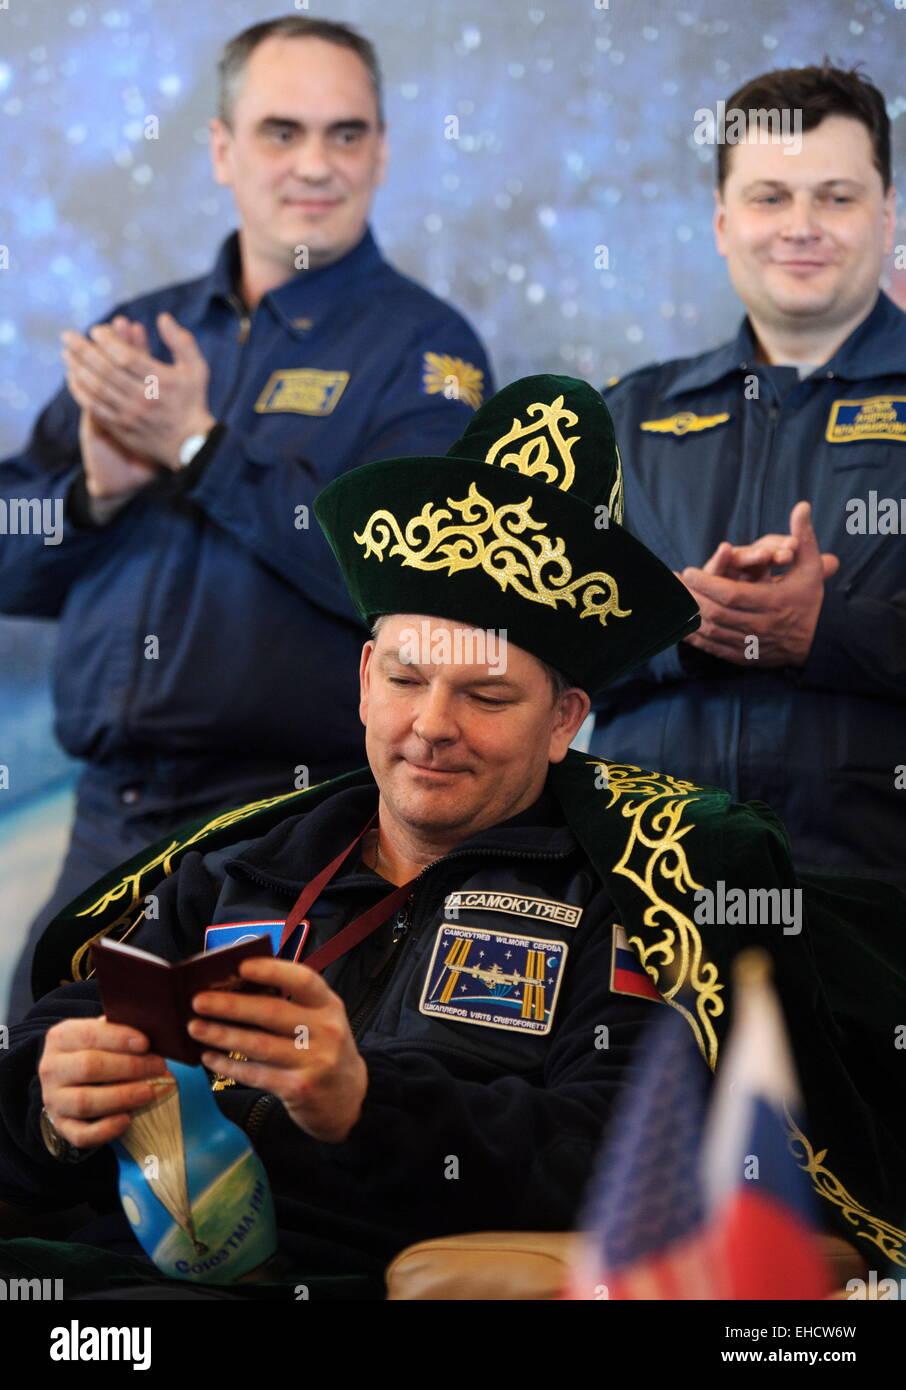 Qaraghandy, Kazakhstan. 12th Mar, 2015. Soyuz TMA-14M spacecraft crew member, Russia's cosmonaut Alexander Samokutyayev - Stock Image